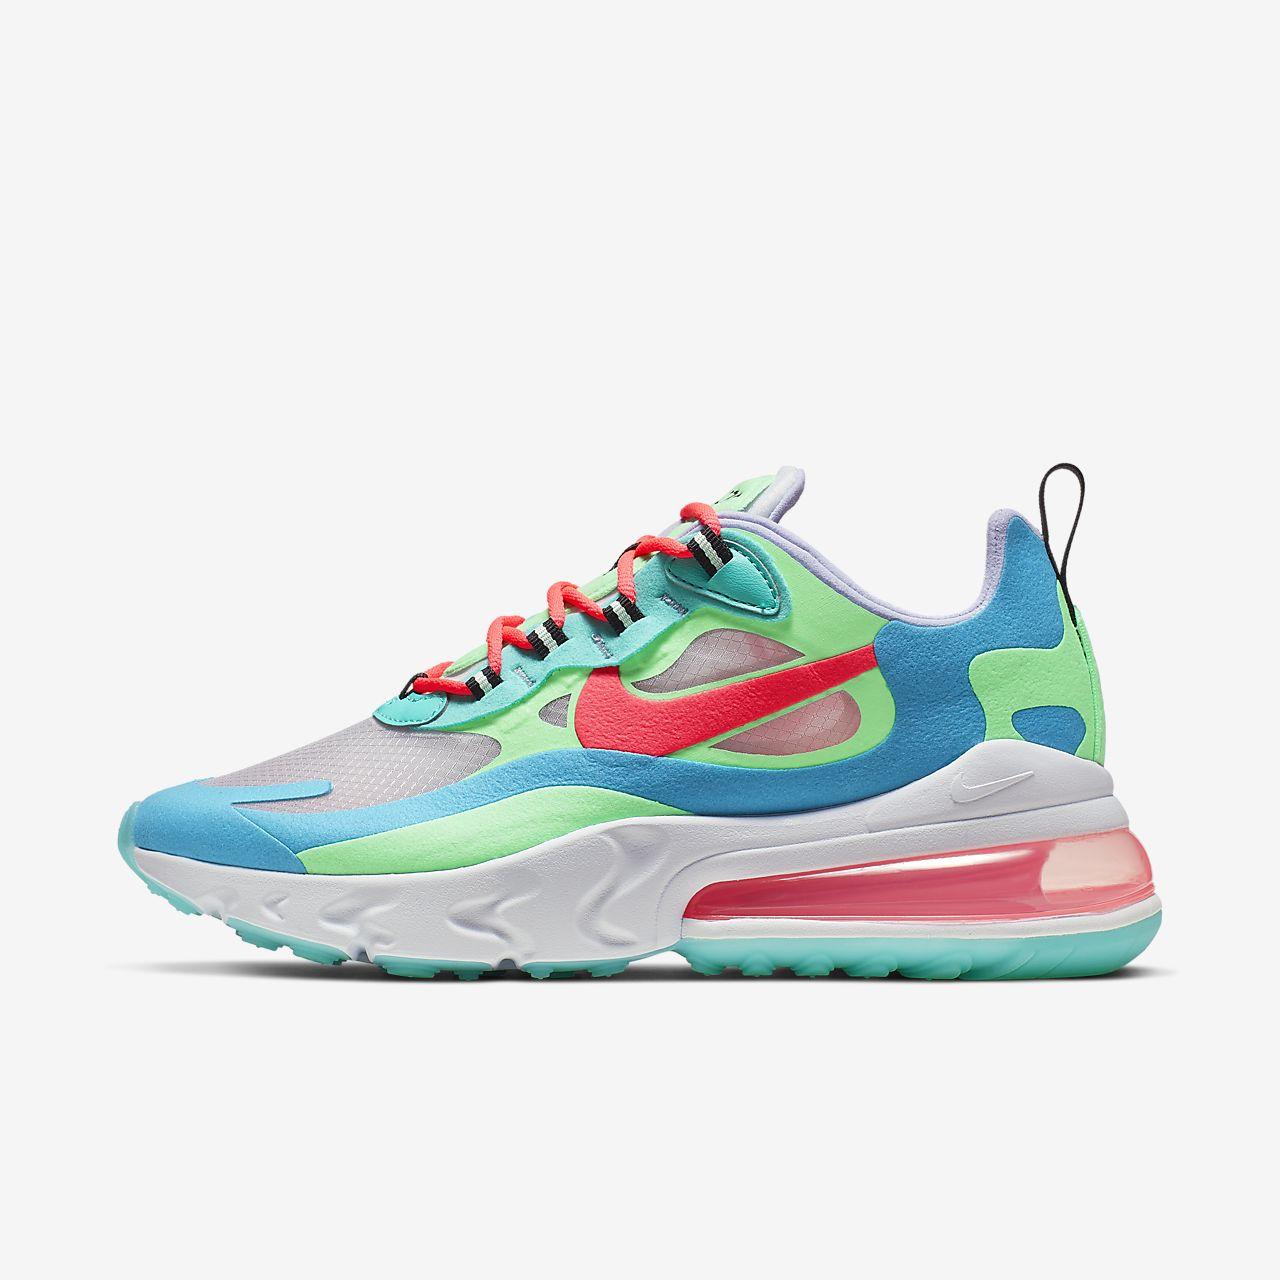 Air React 270 Nike Chaussure Femmebe Pour Max Tu135klfjc b7fg6y